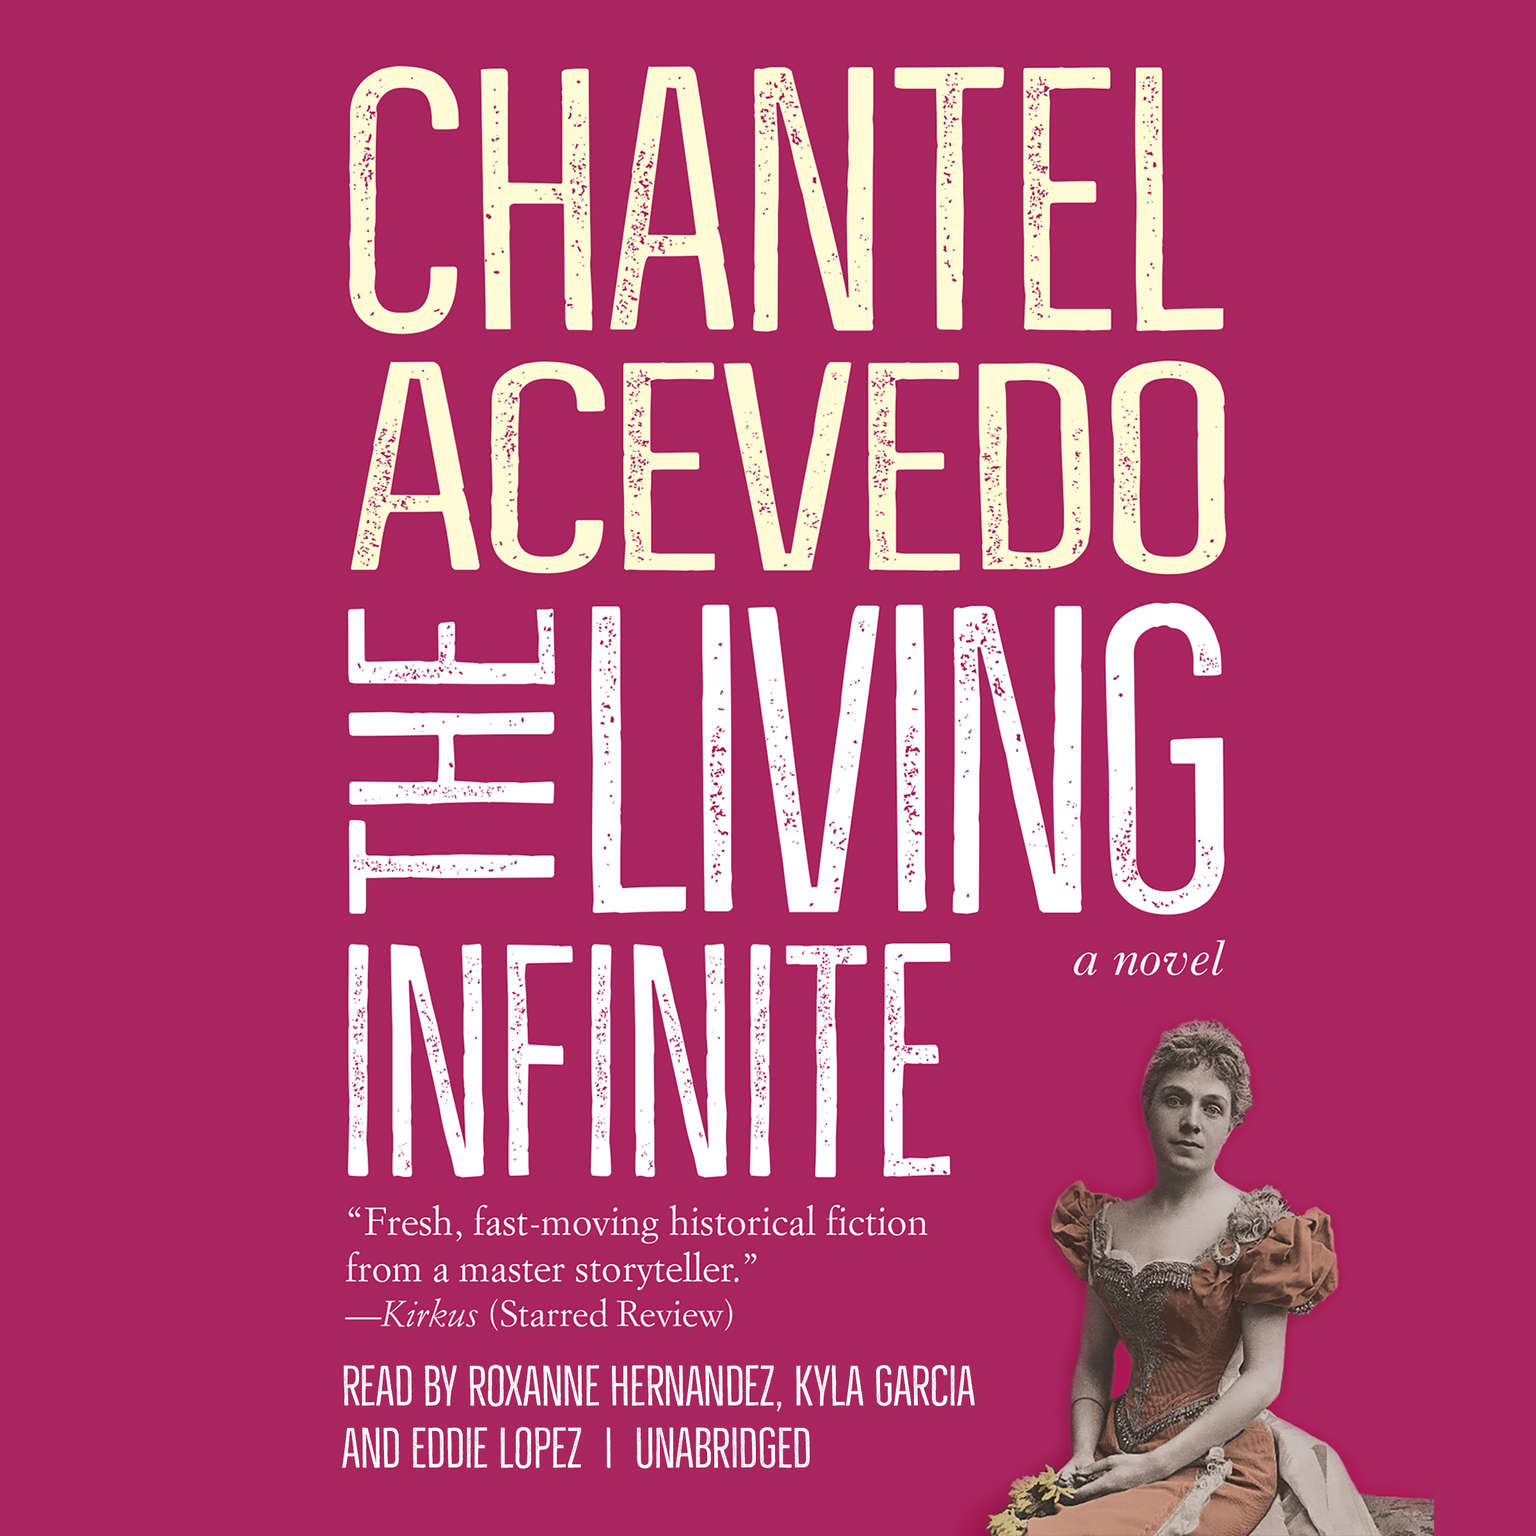 The Living Infinite: A Novel Audiobook, by Chantel Acevedo